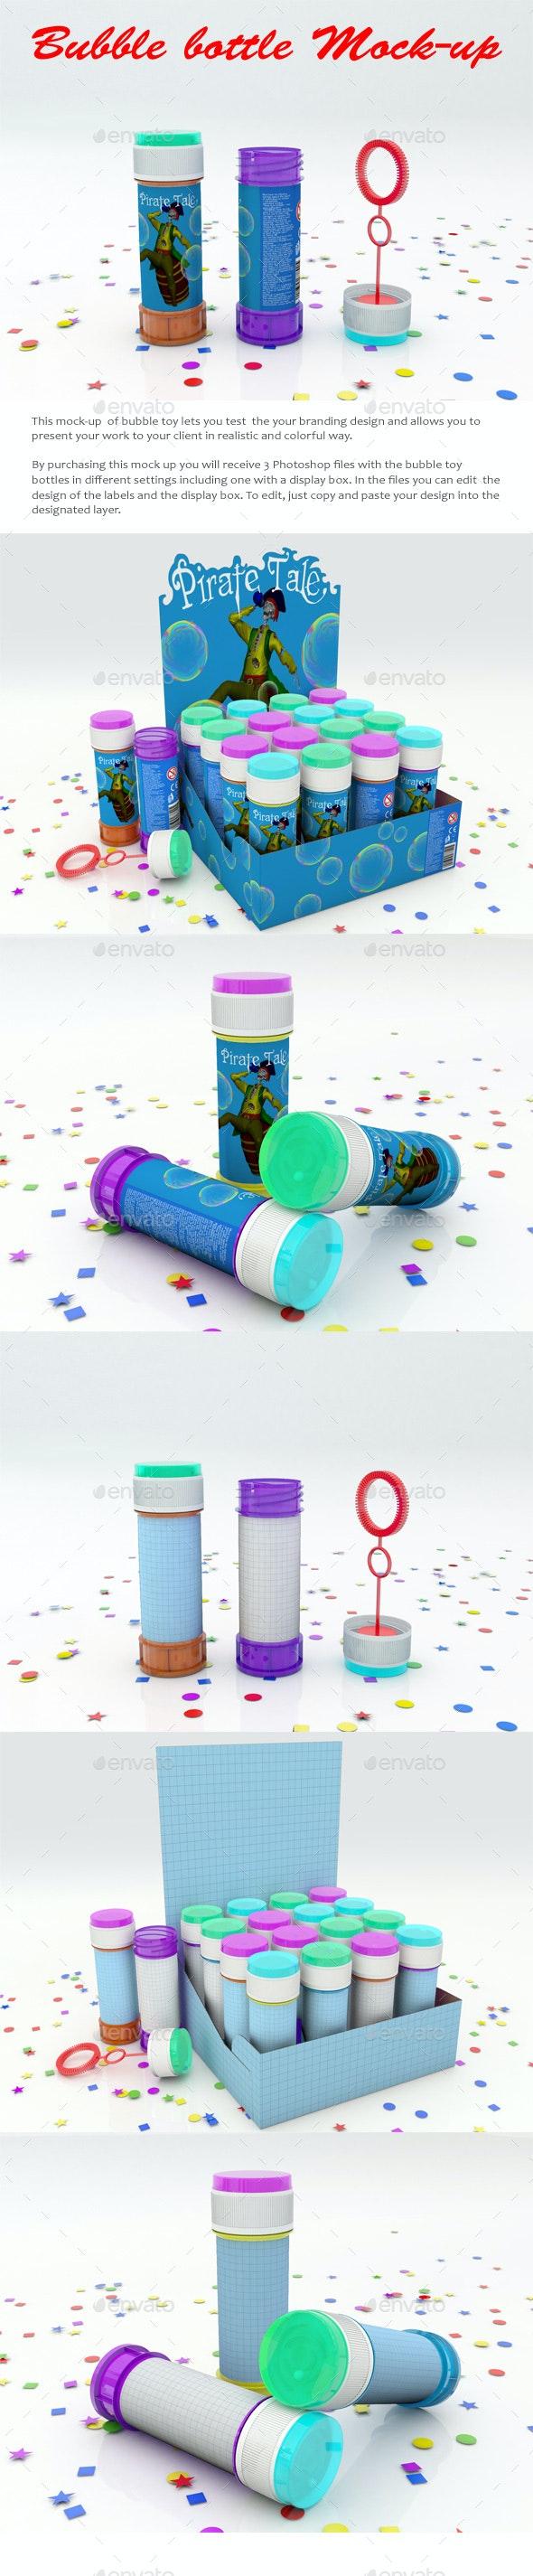 Soap Bubbles Bottle Mock-Up - Miscellaneous Packaging